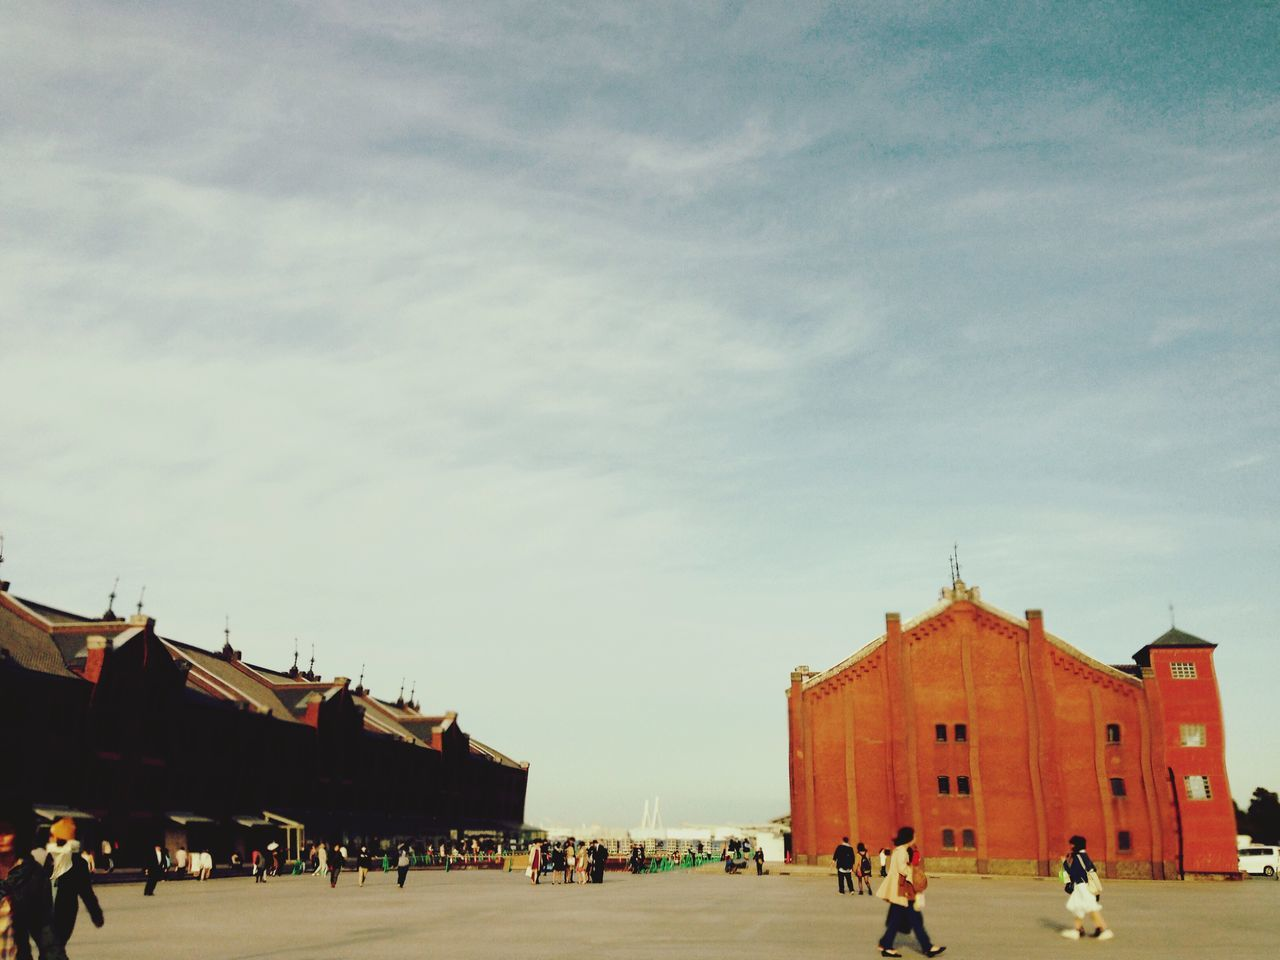 Yokohama Yokohama-shi Yokohama Sky Japan Brick Bricks Redbrick Redbricks Architecture Architecture_collection